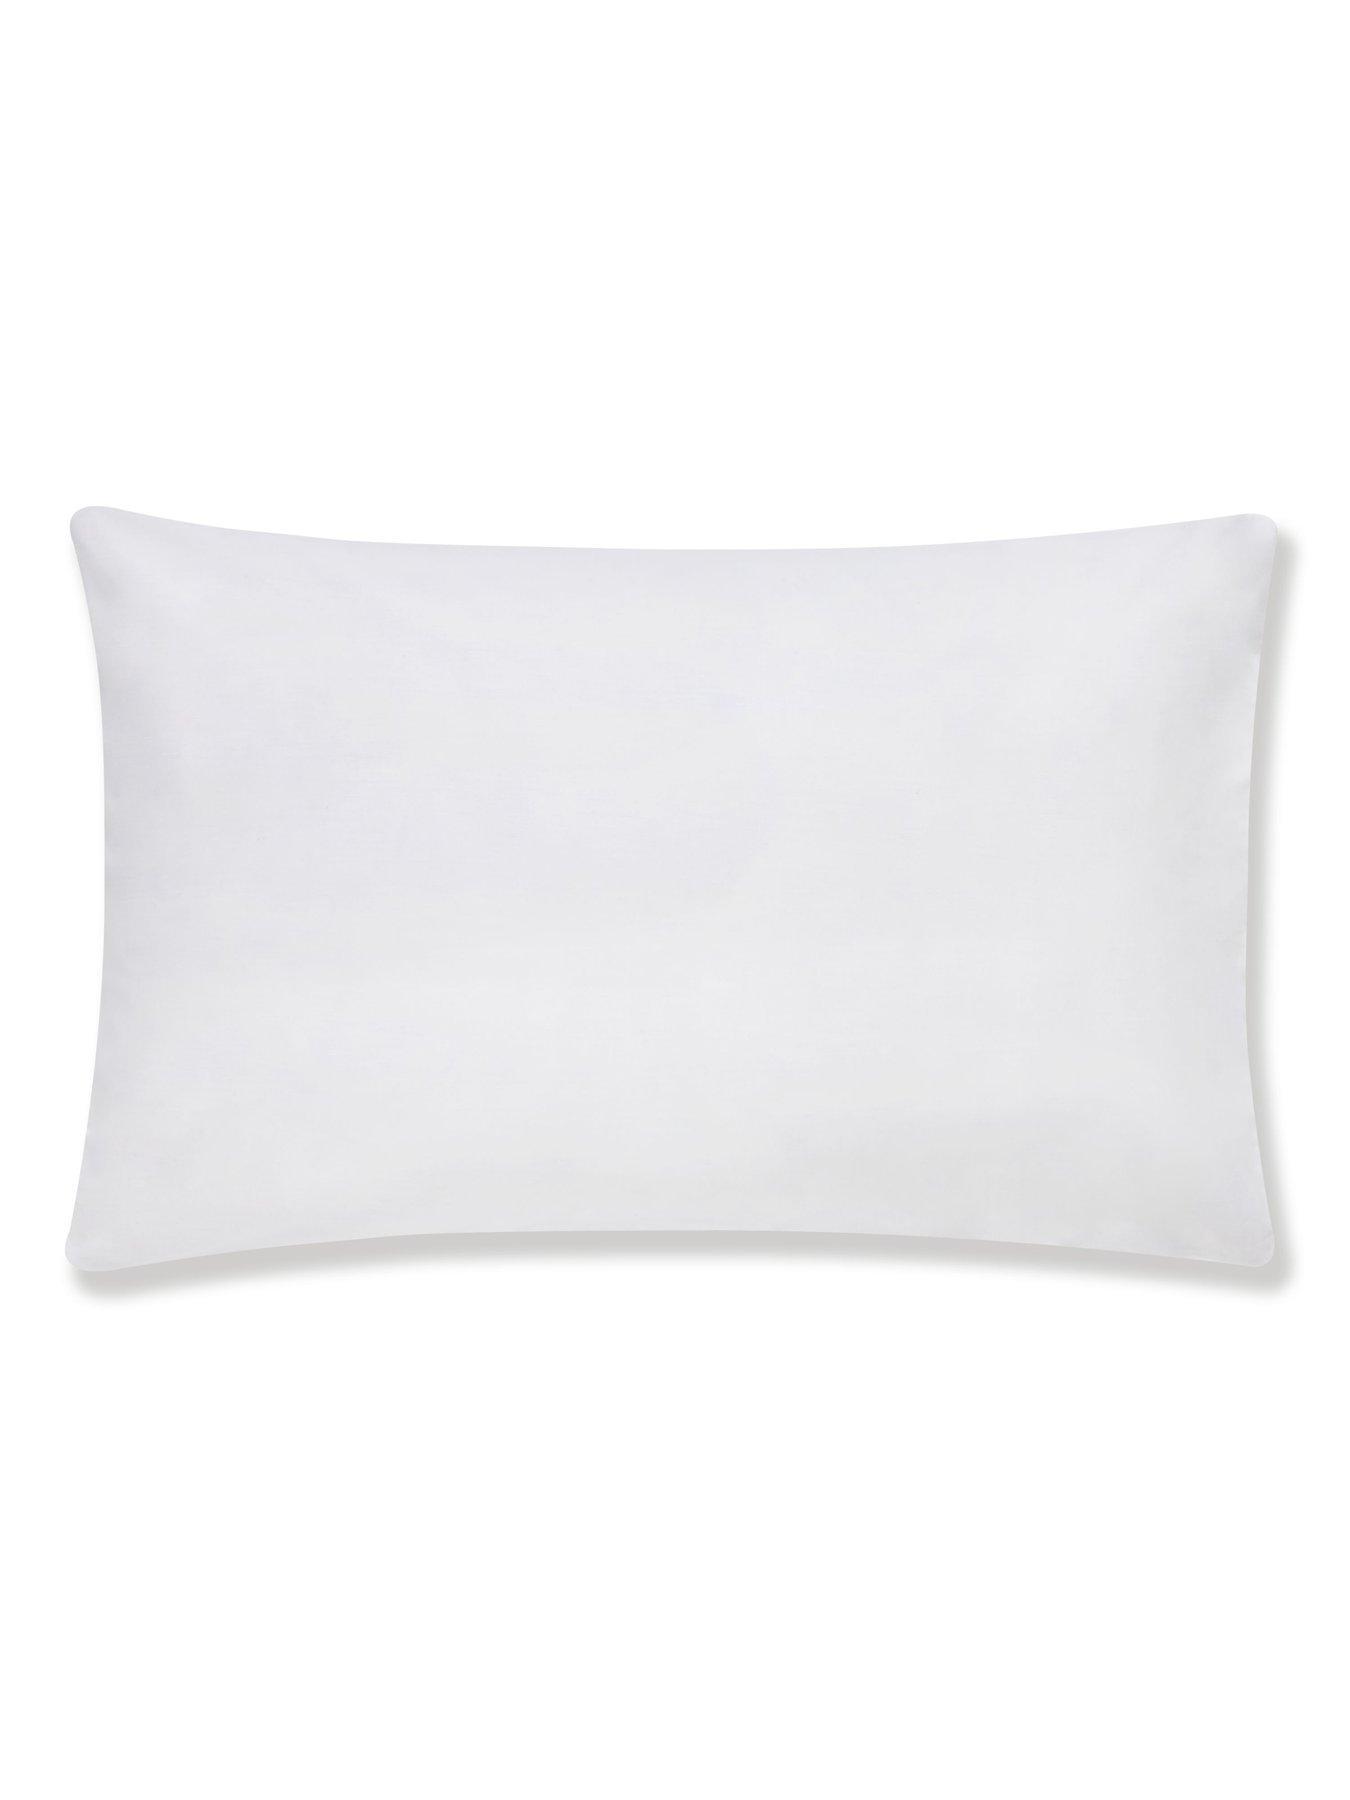 2 x Pillow Cases Pair 100% Egyptian